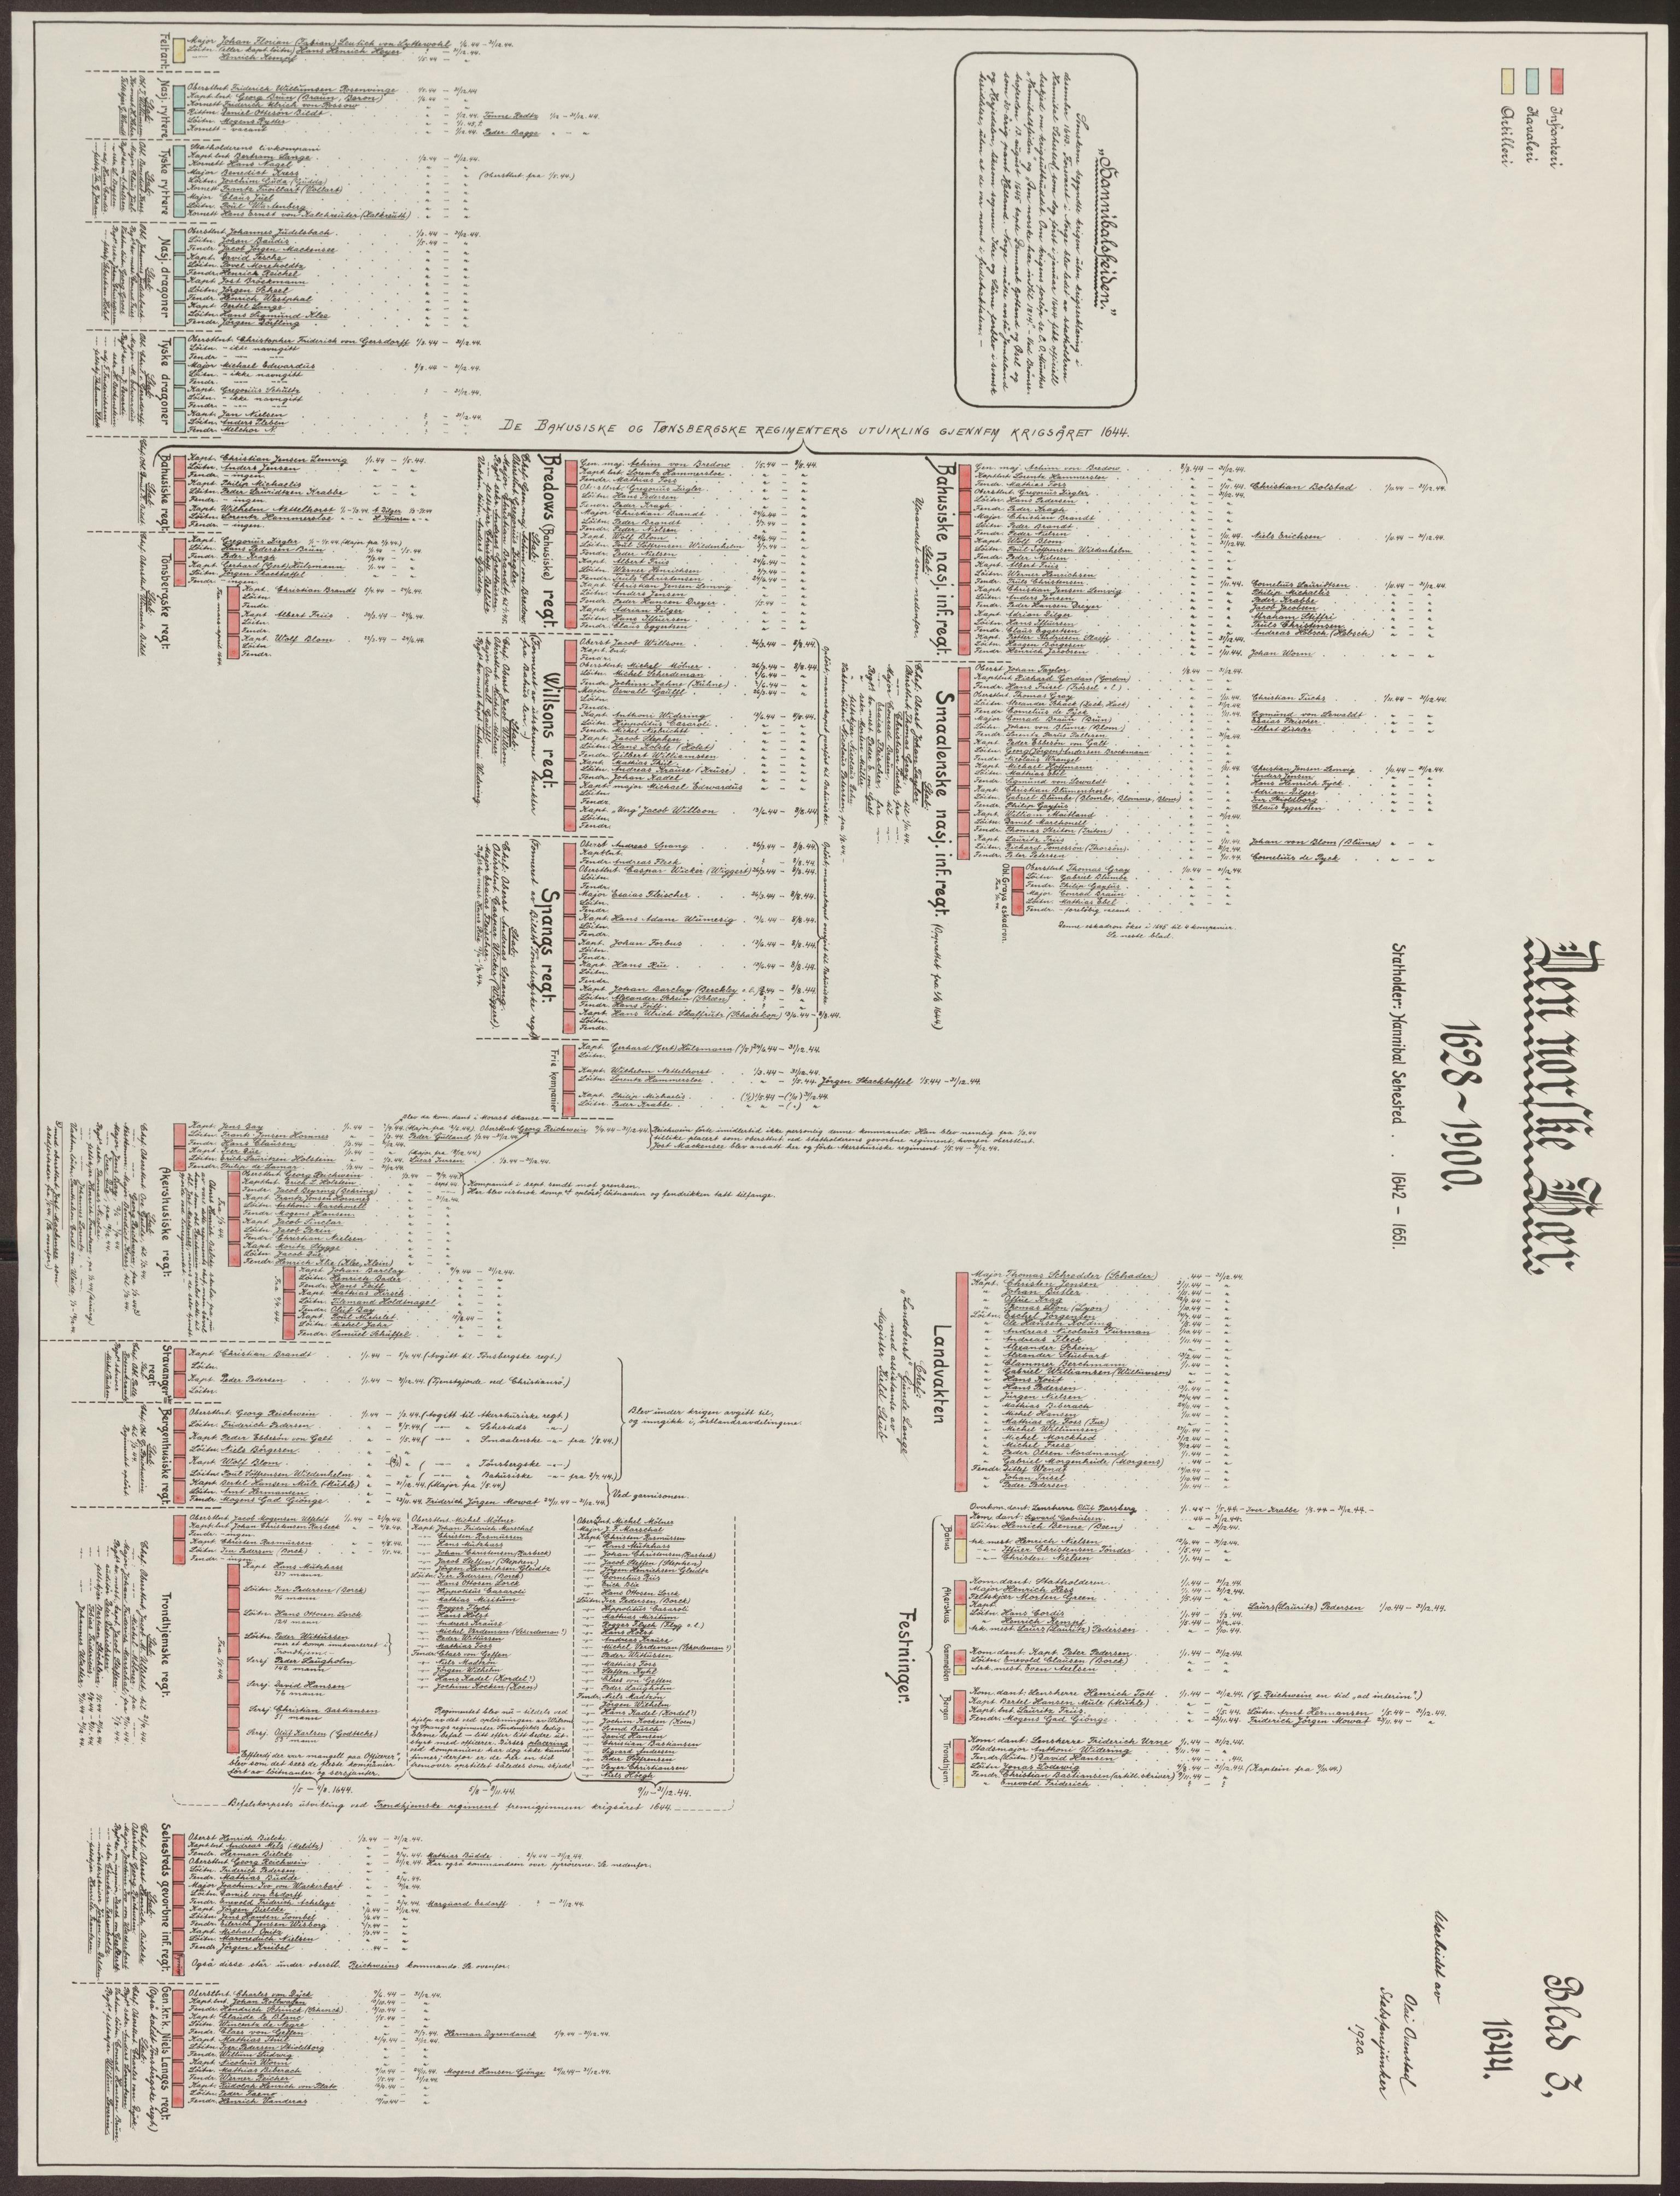 RA, Riksarkivets bibliotek, 1628-1818, s. 3